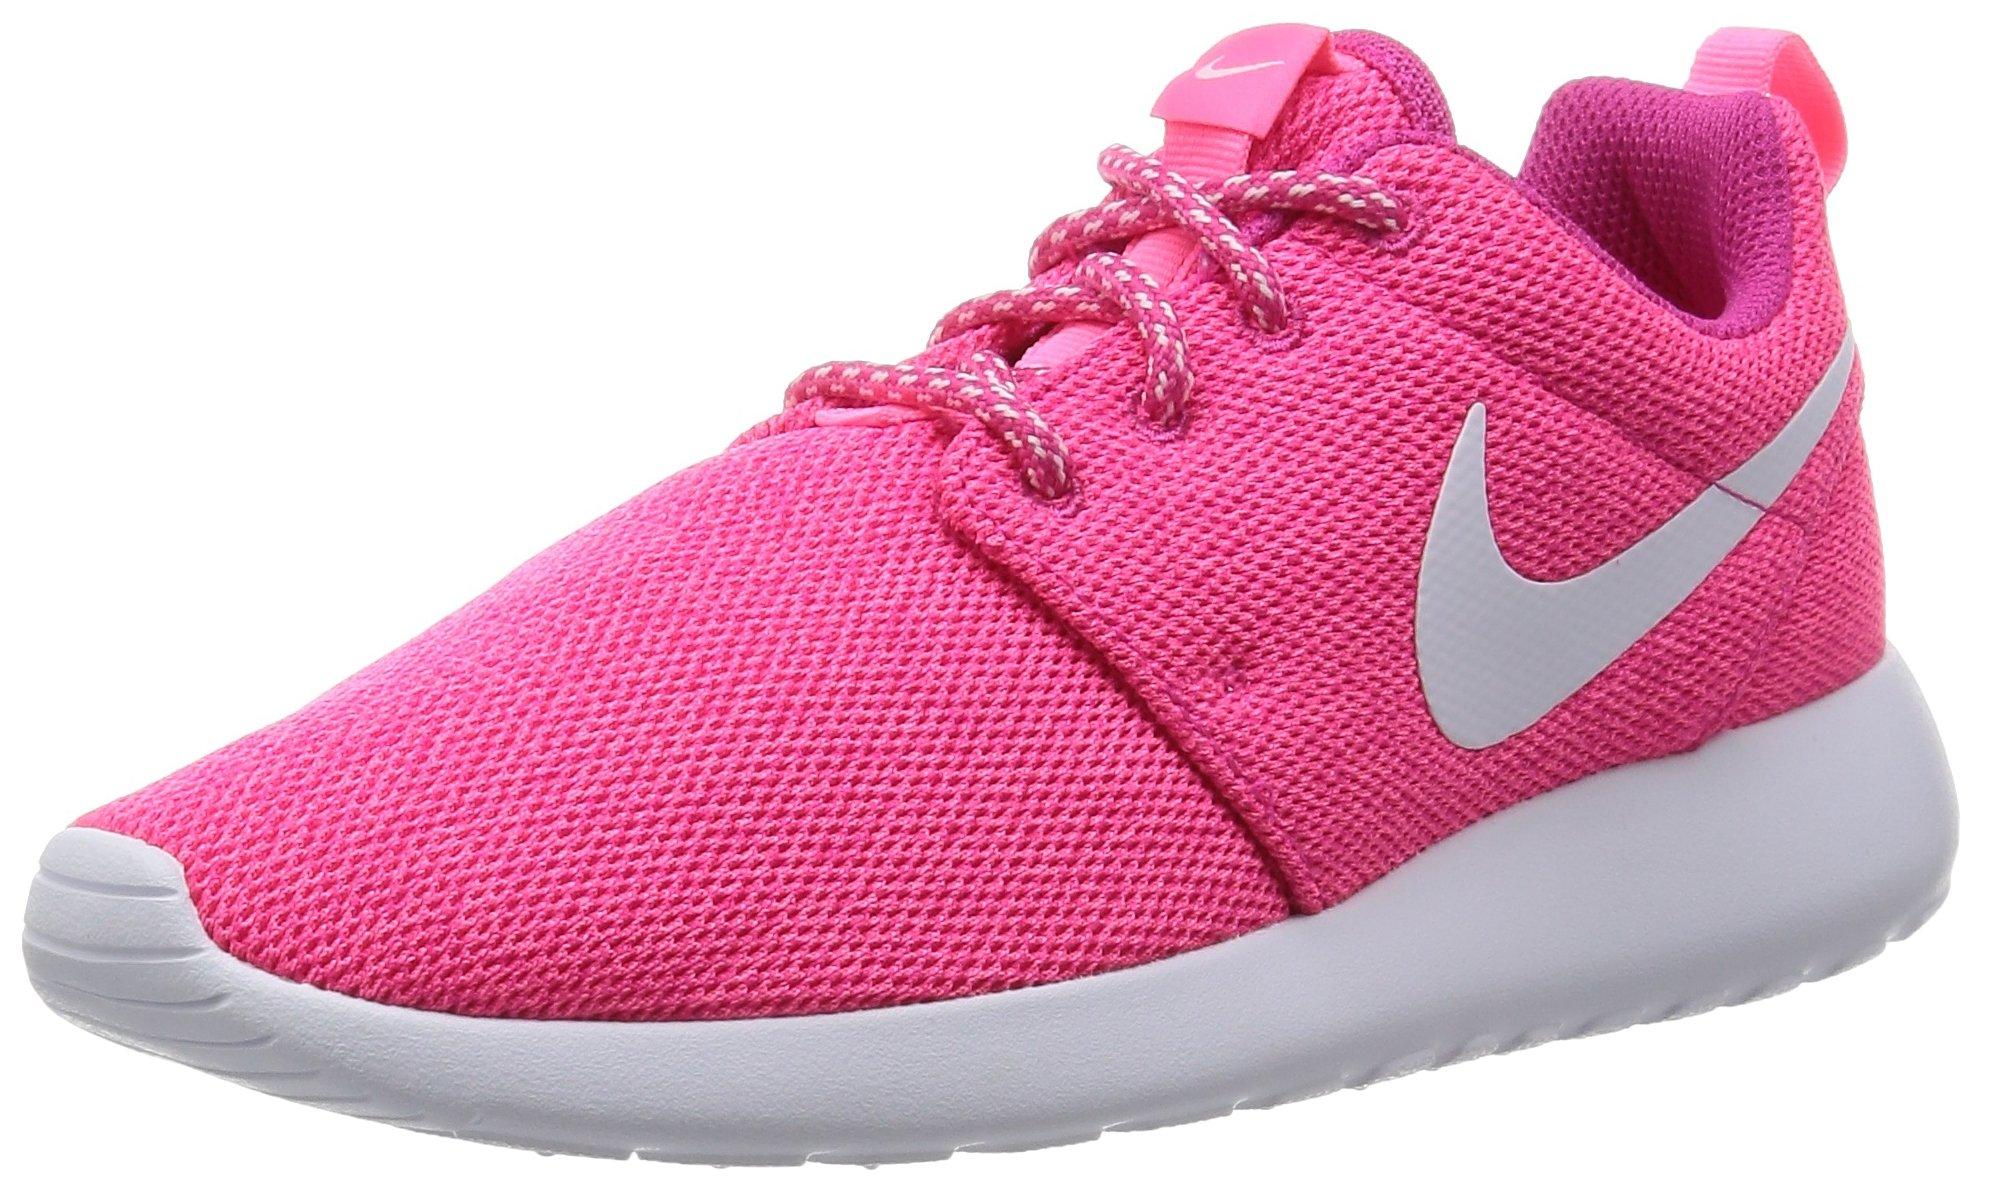 NIKE Womens Roshe One Running Shoes (7.5 B(M) US)(Vivid Pink/White/Digital Pink)